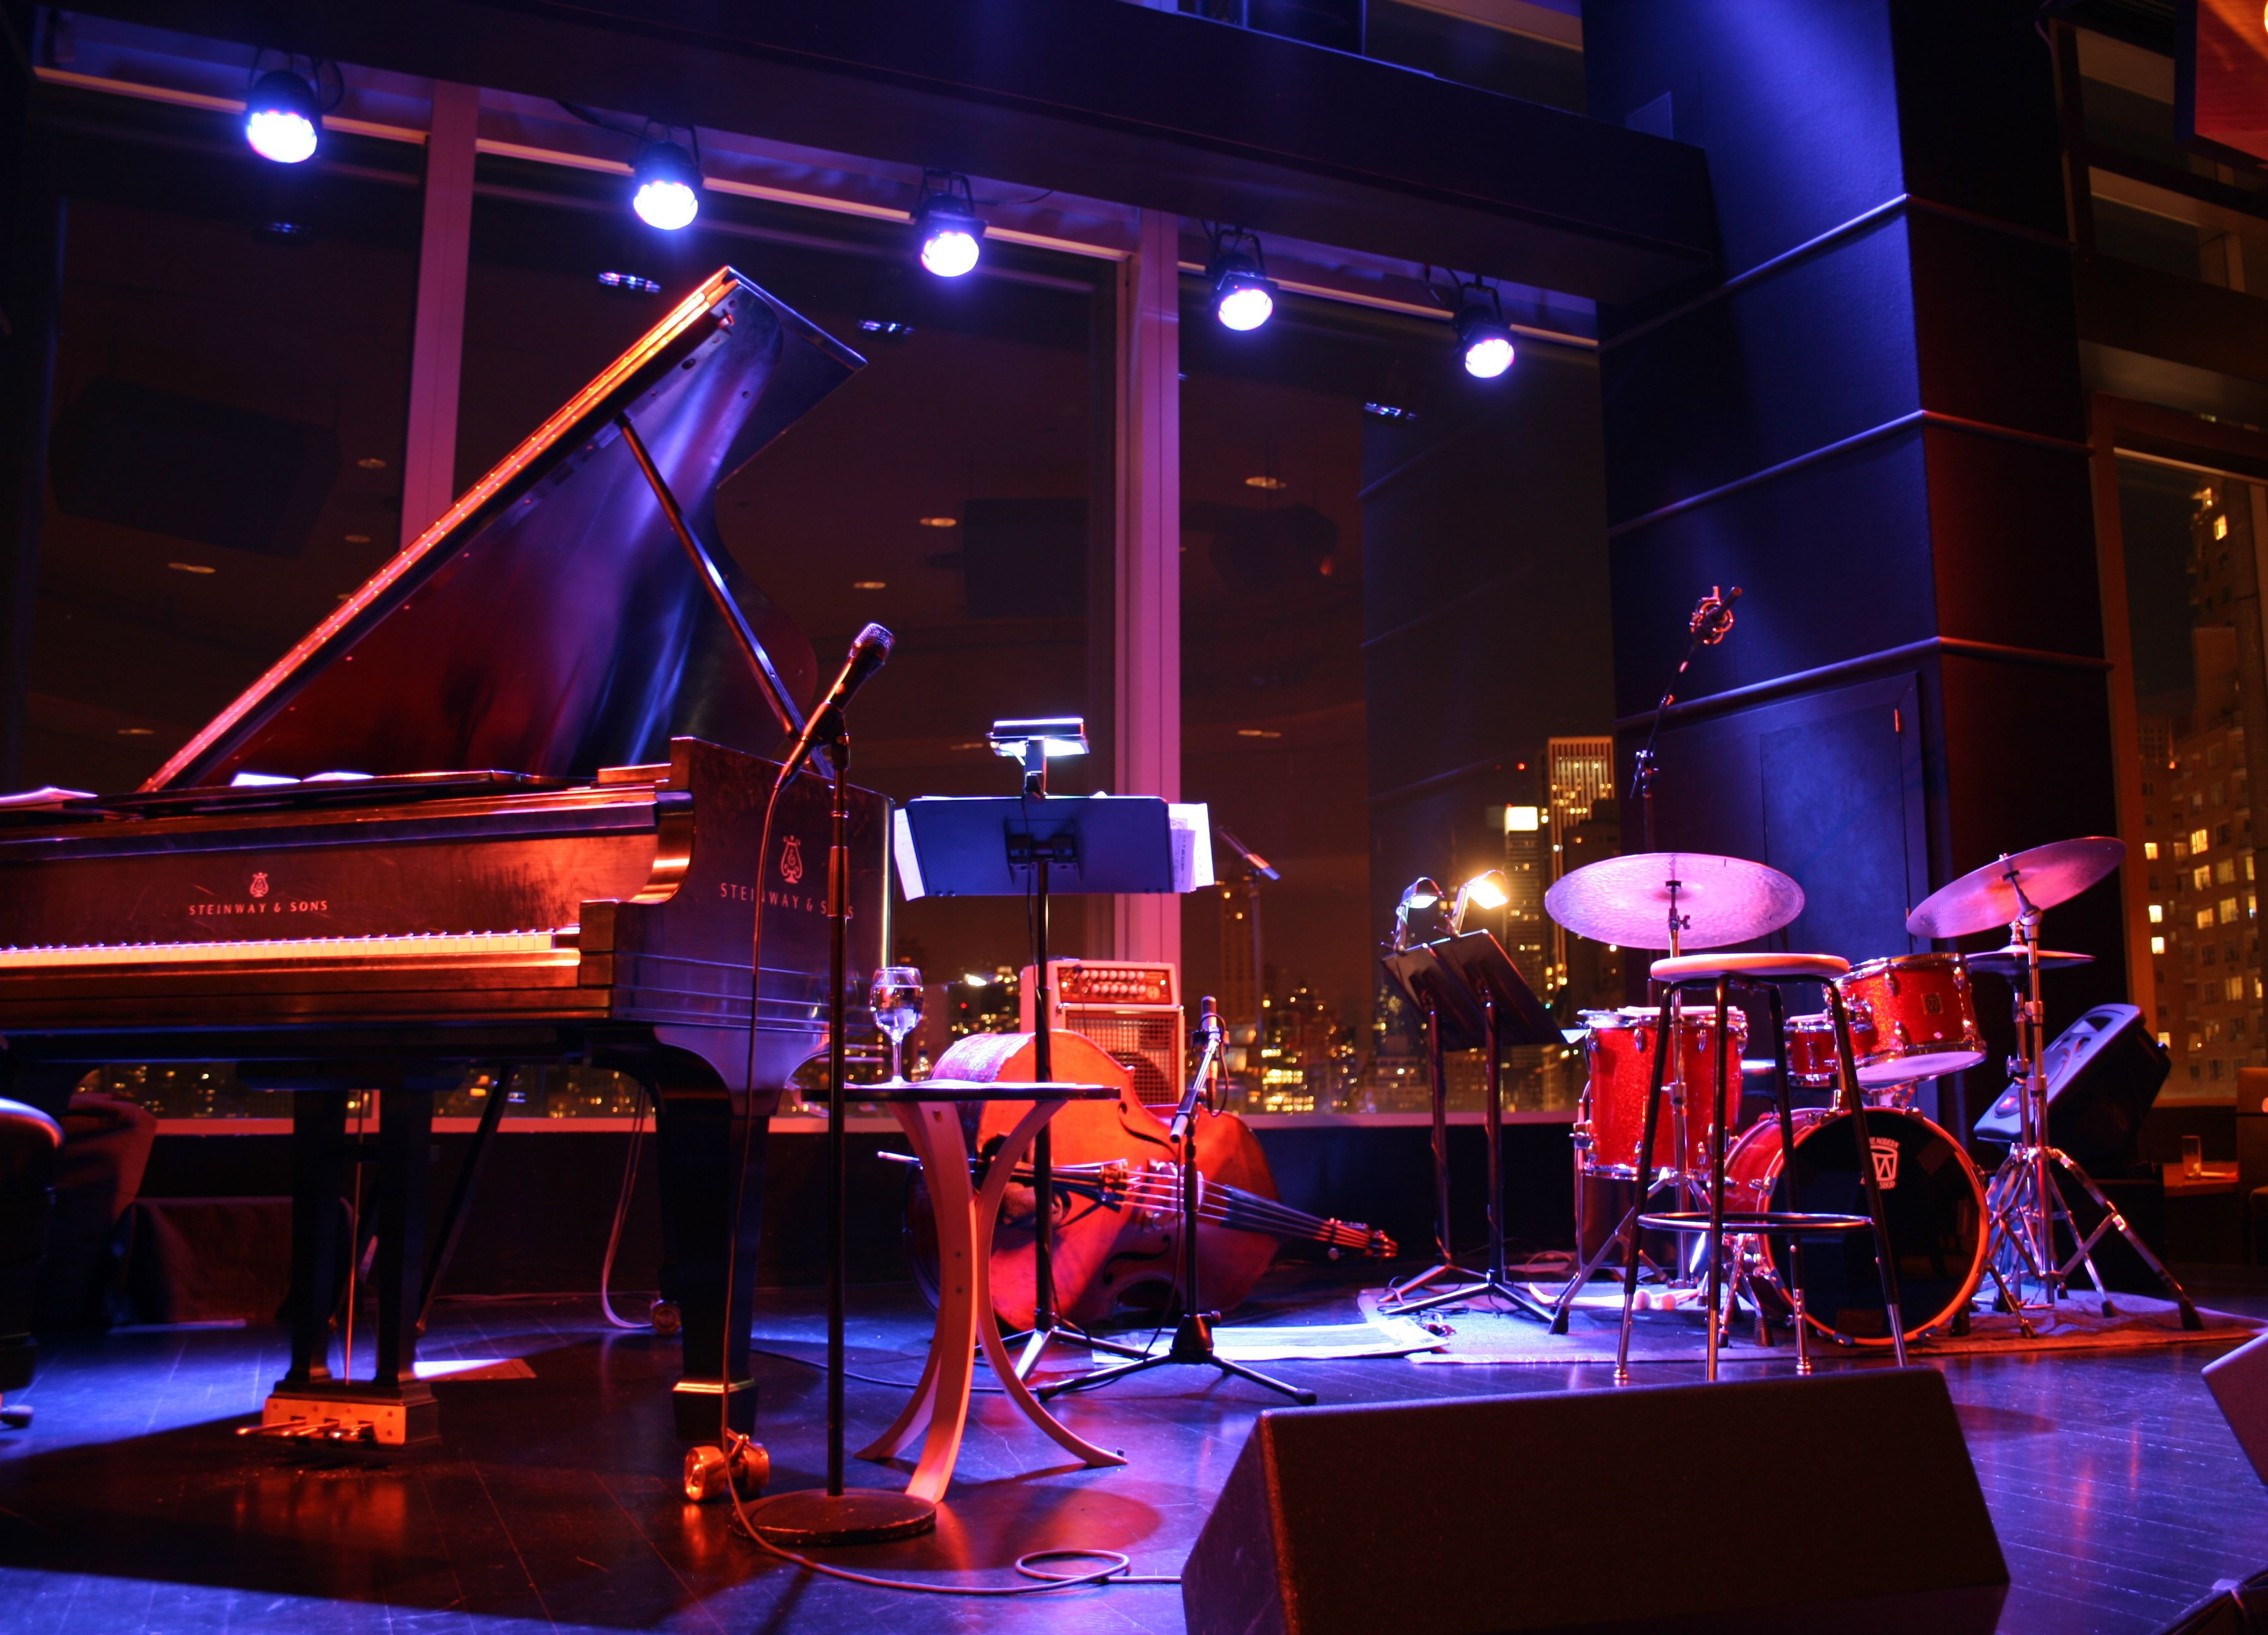 stage lighting jazz lounge jazz bar